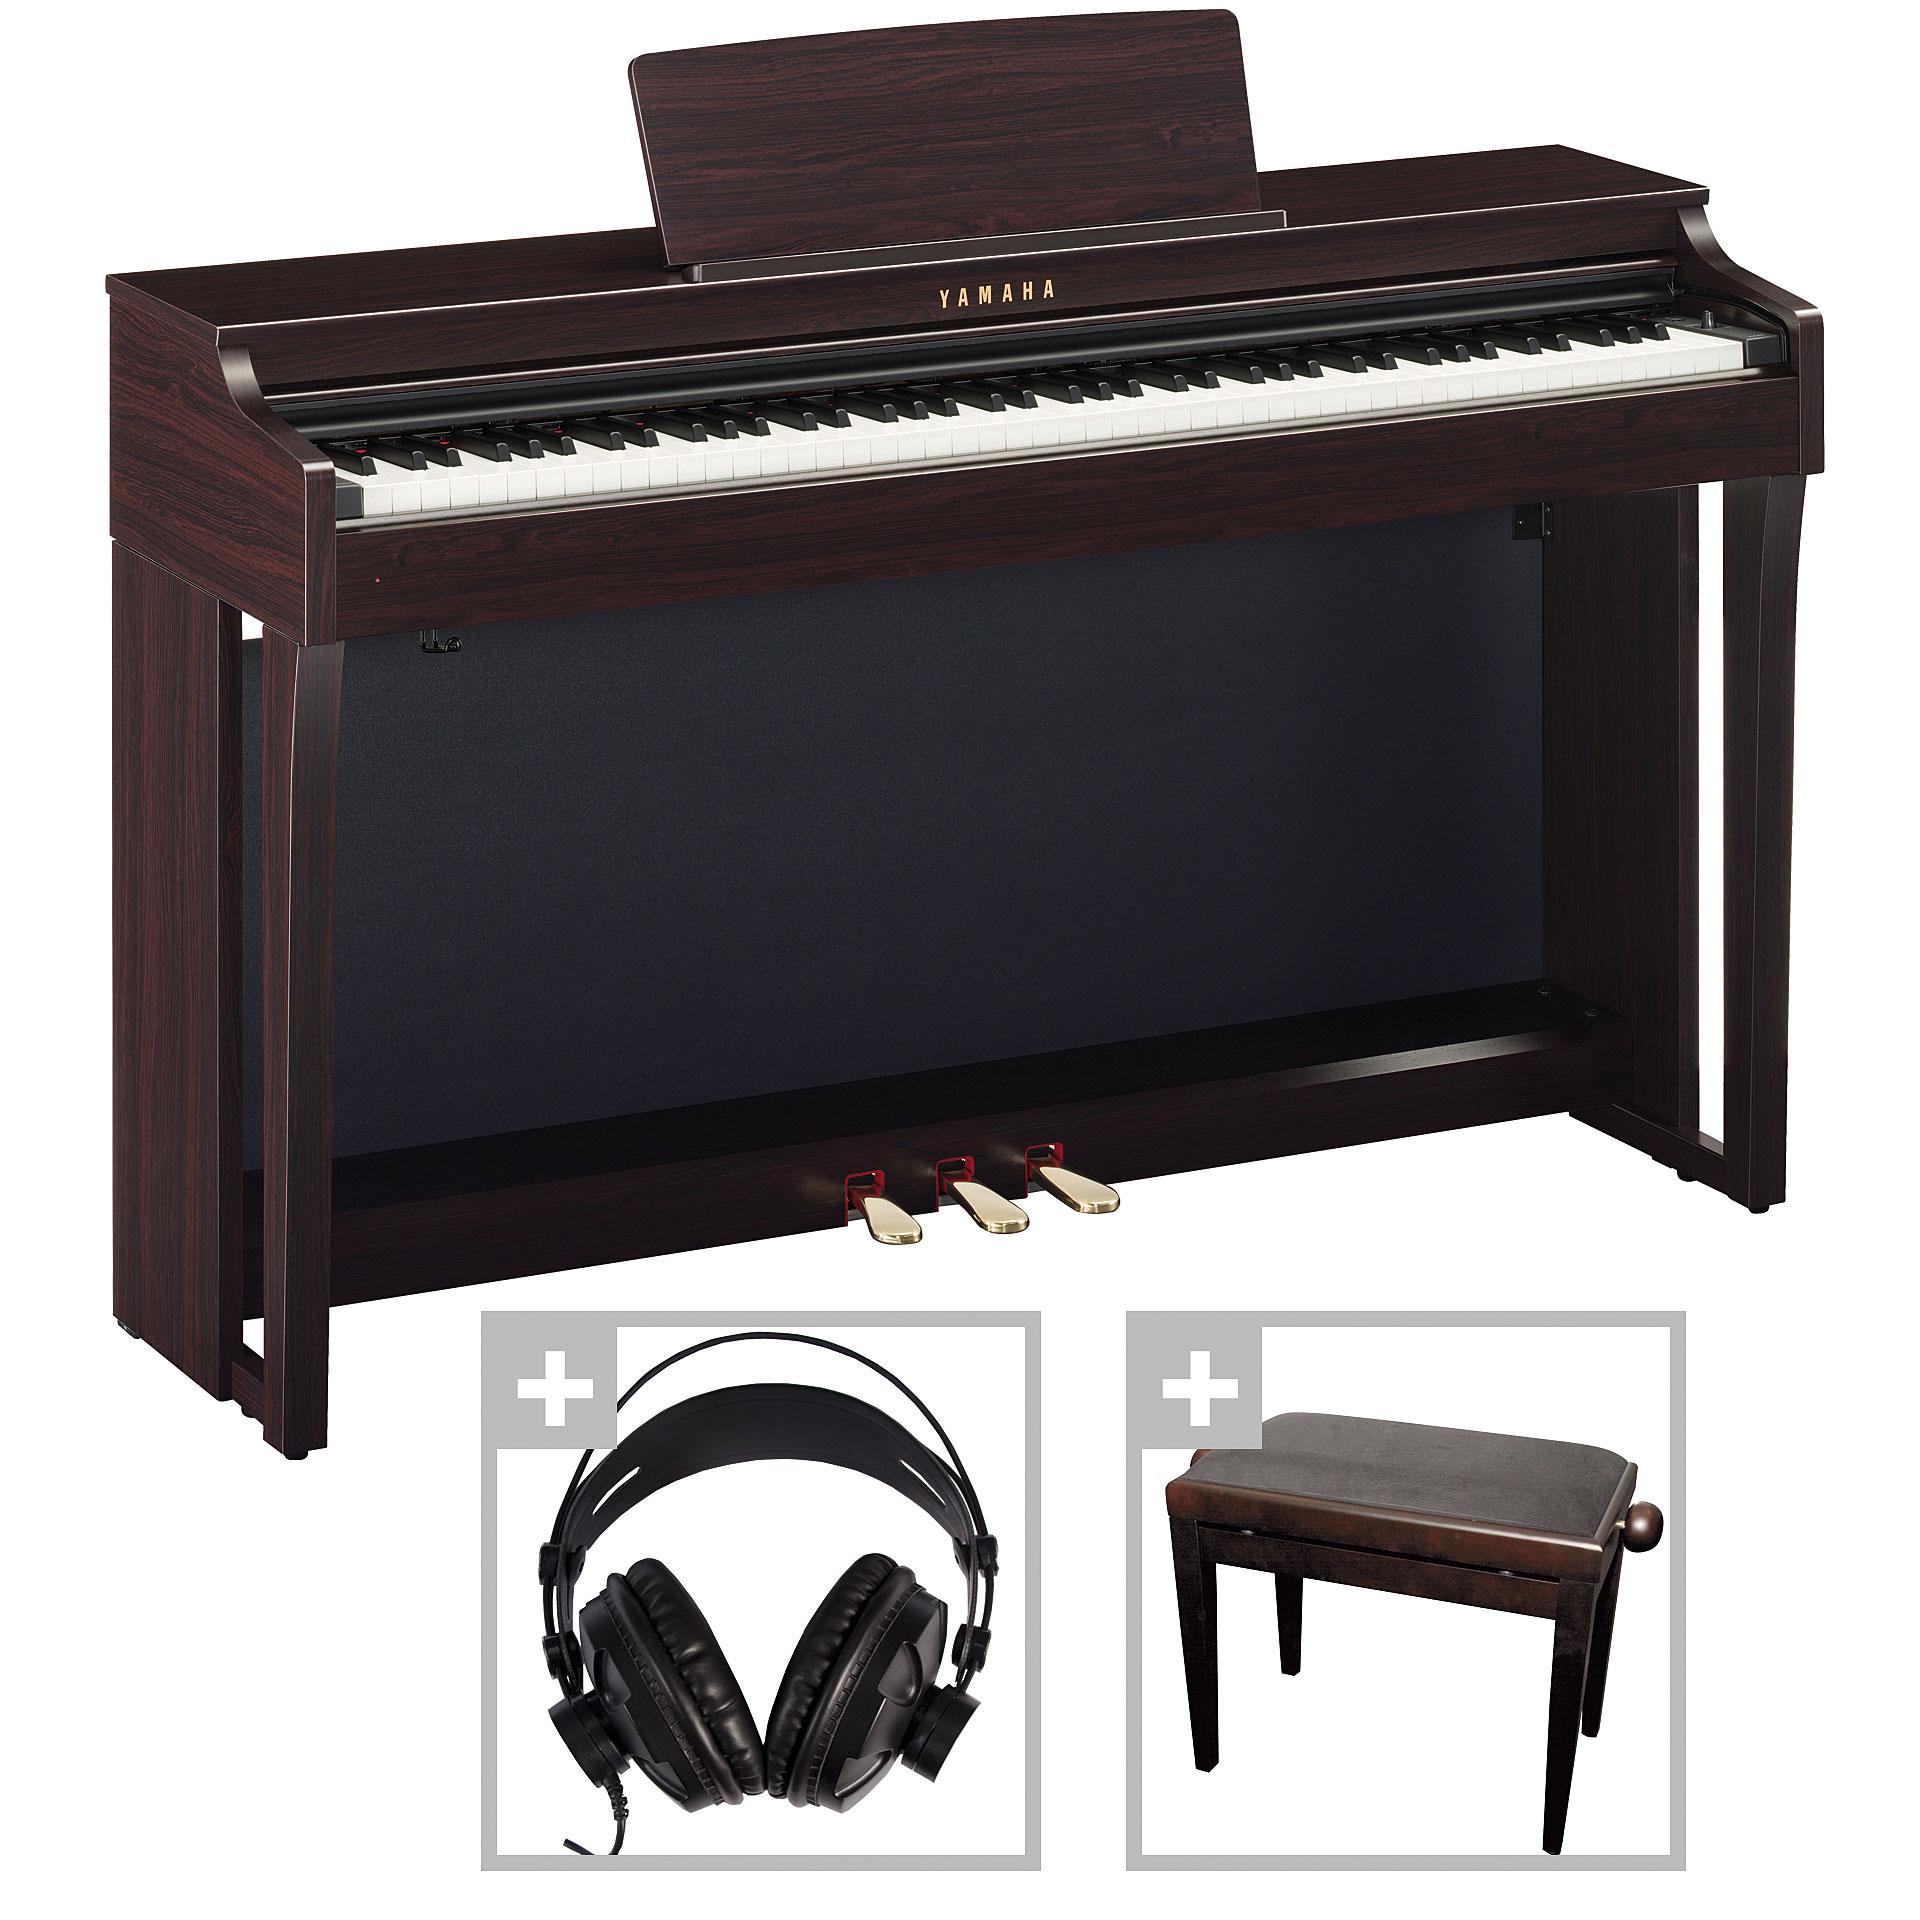 Yamaha clp 625r set digital piano for Yamaha clp 625